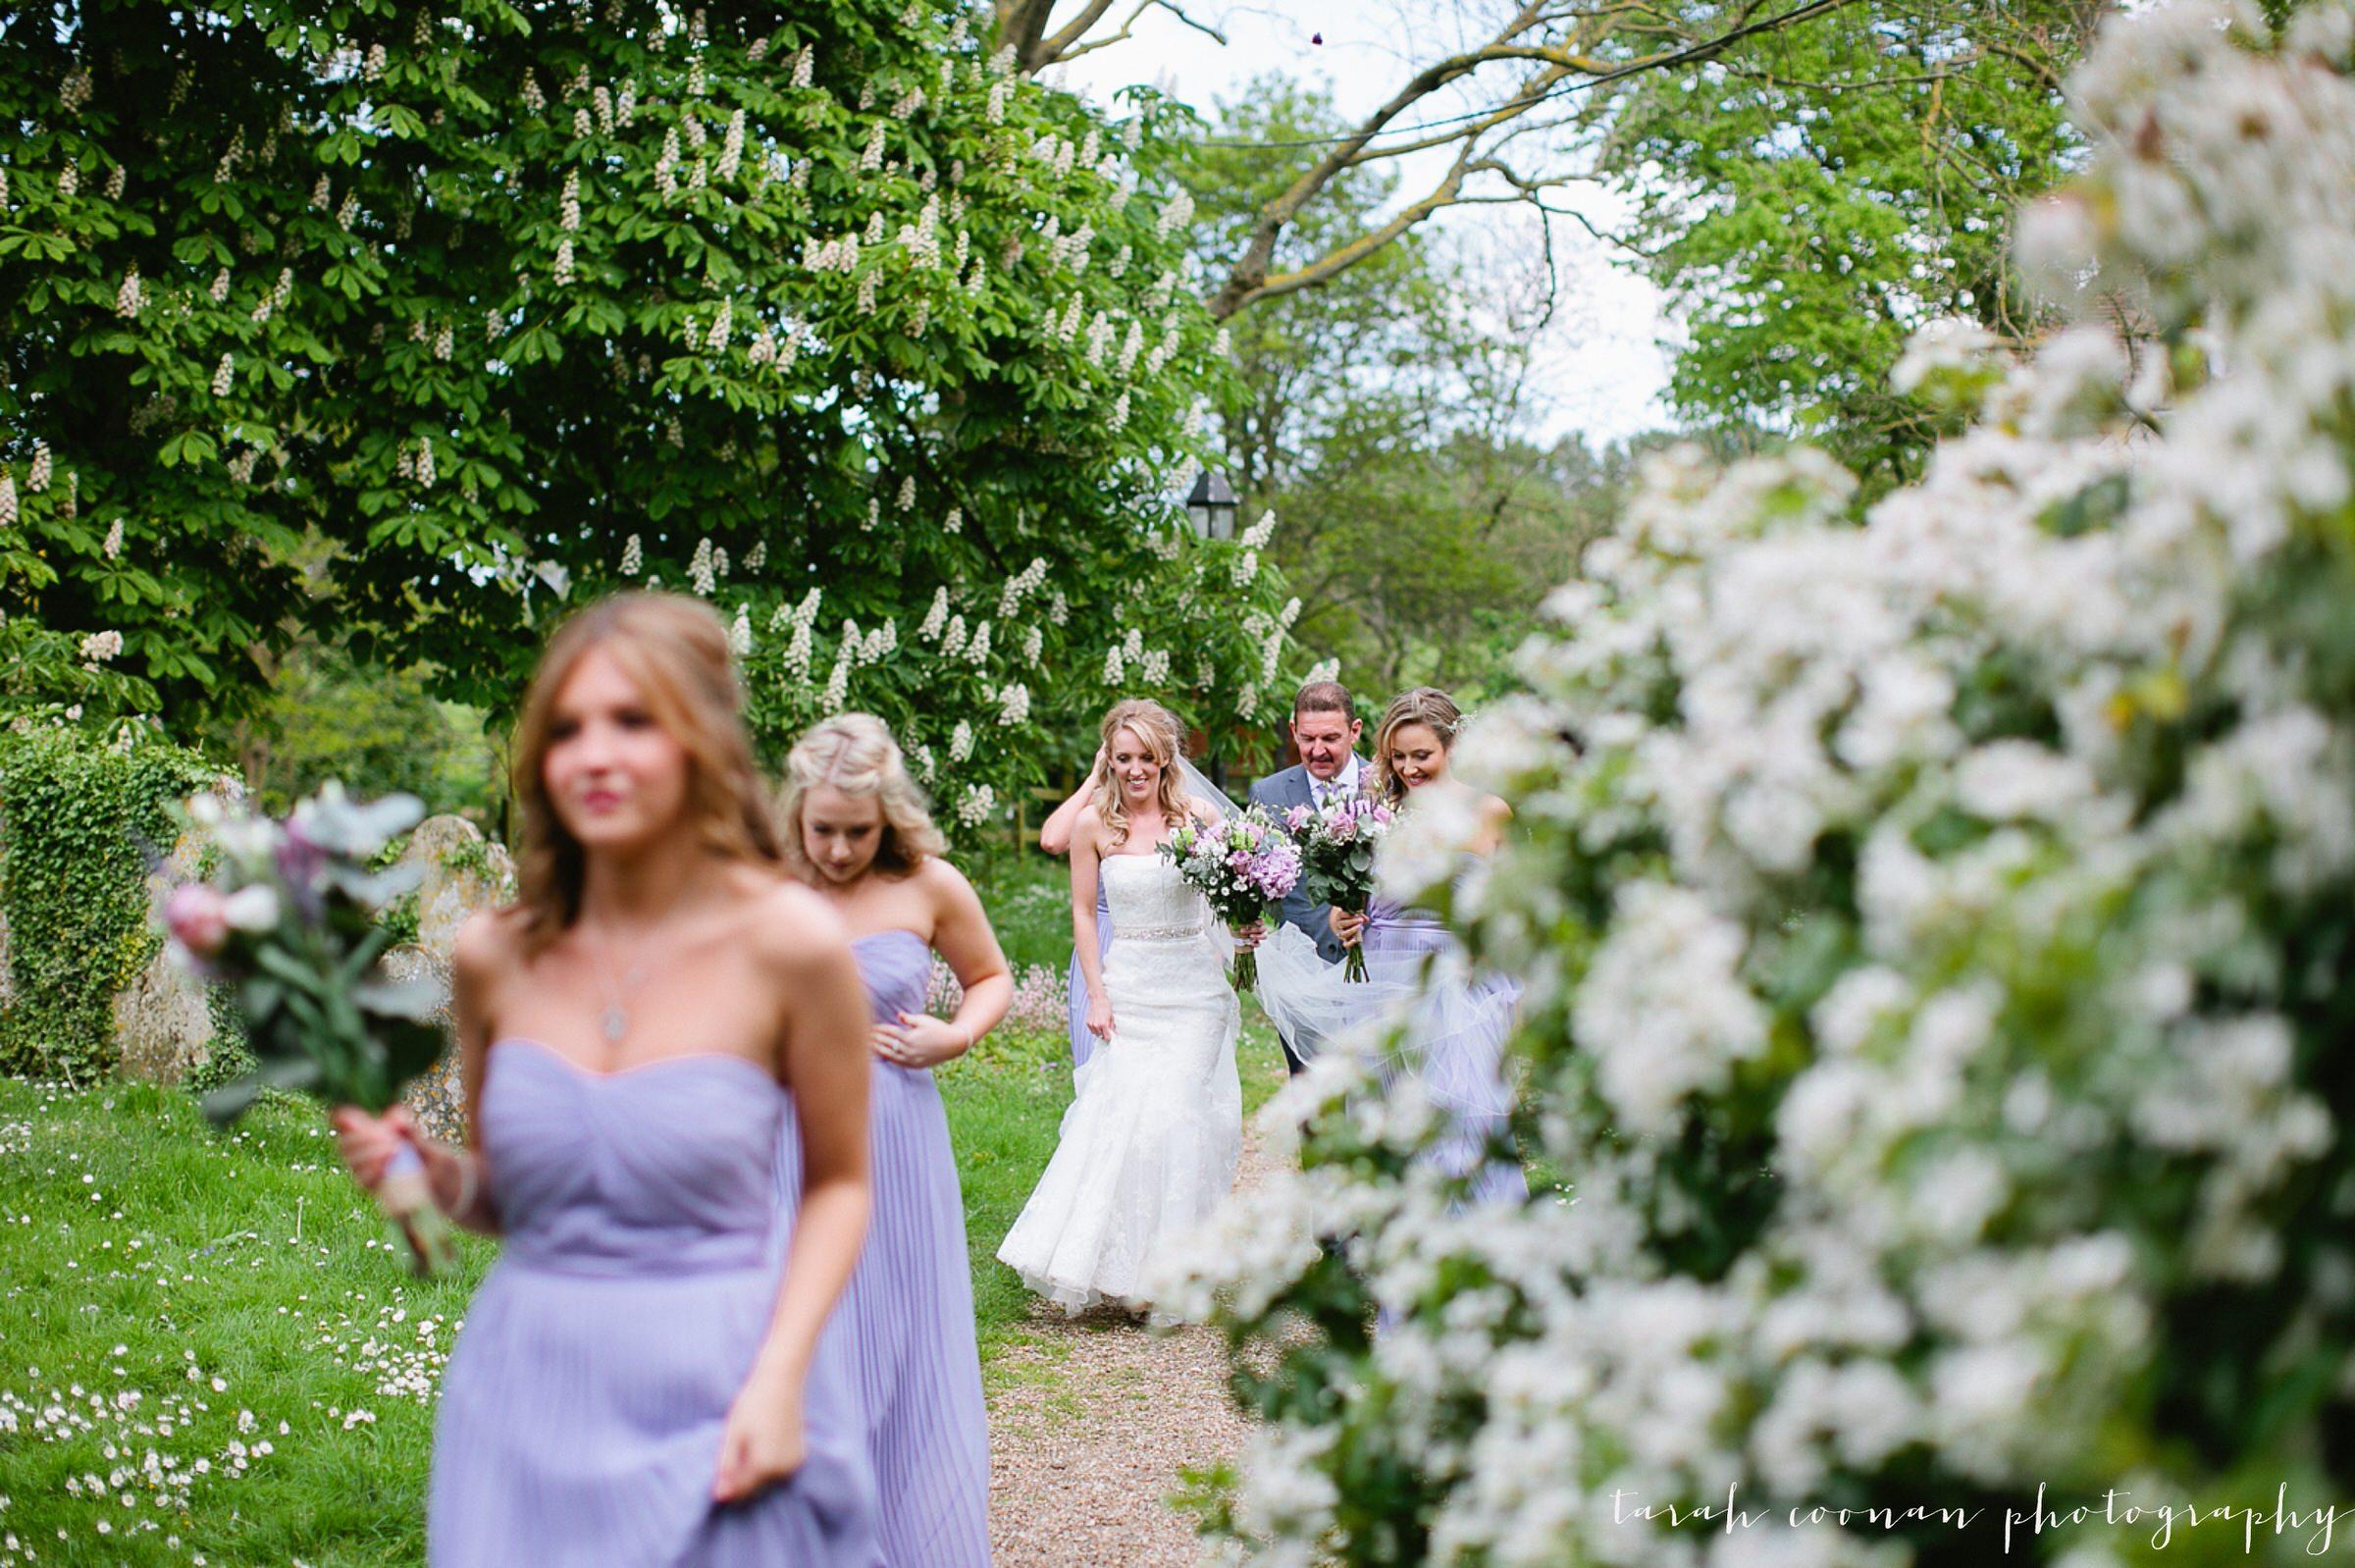 brighton-wedding-photographer10